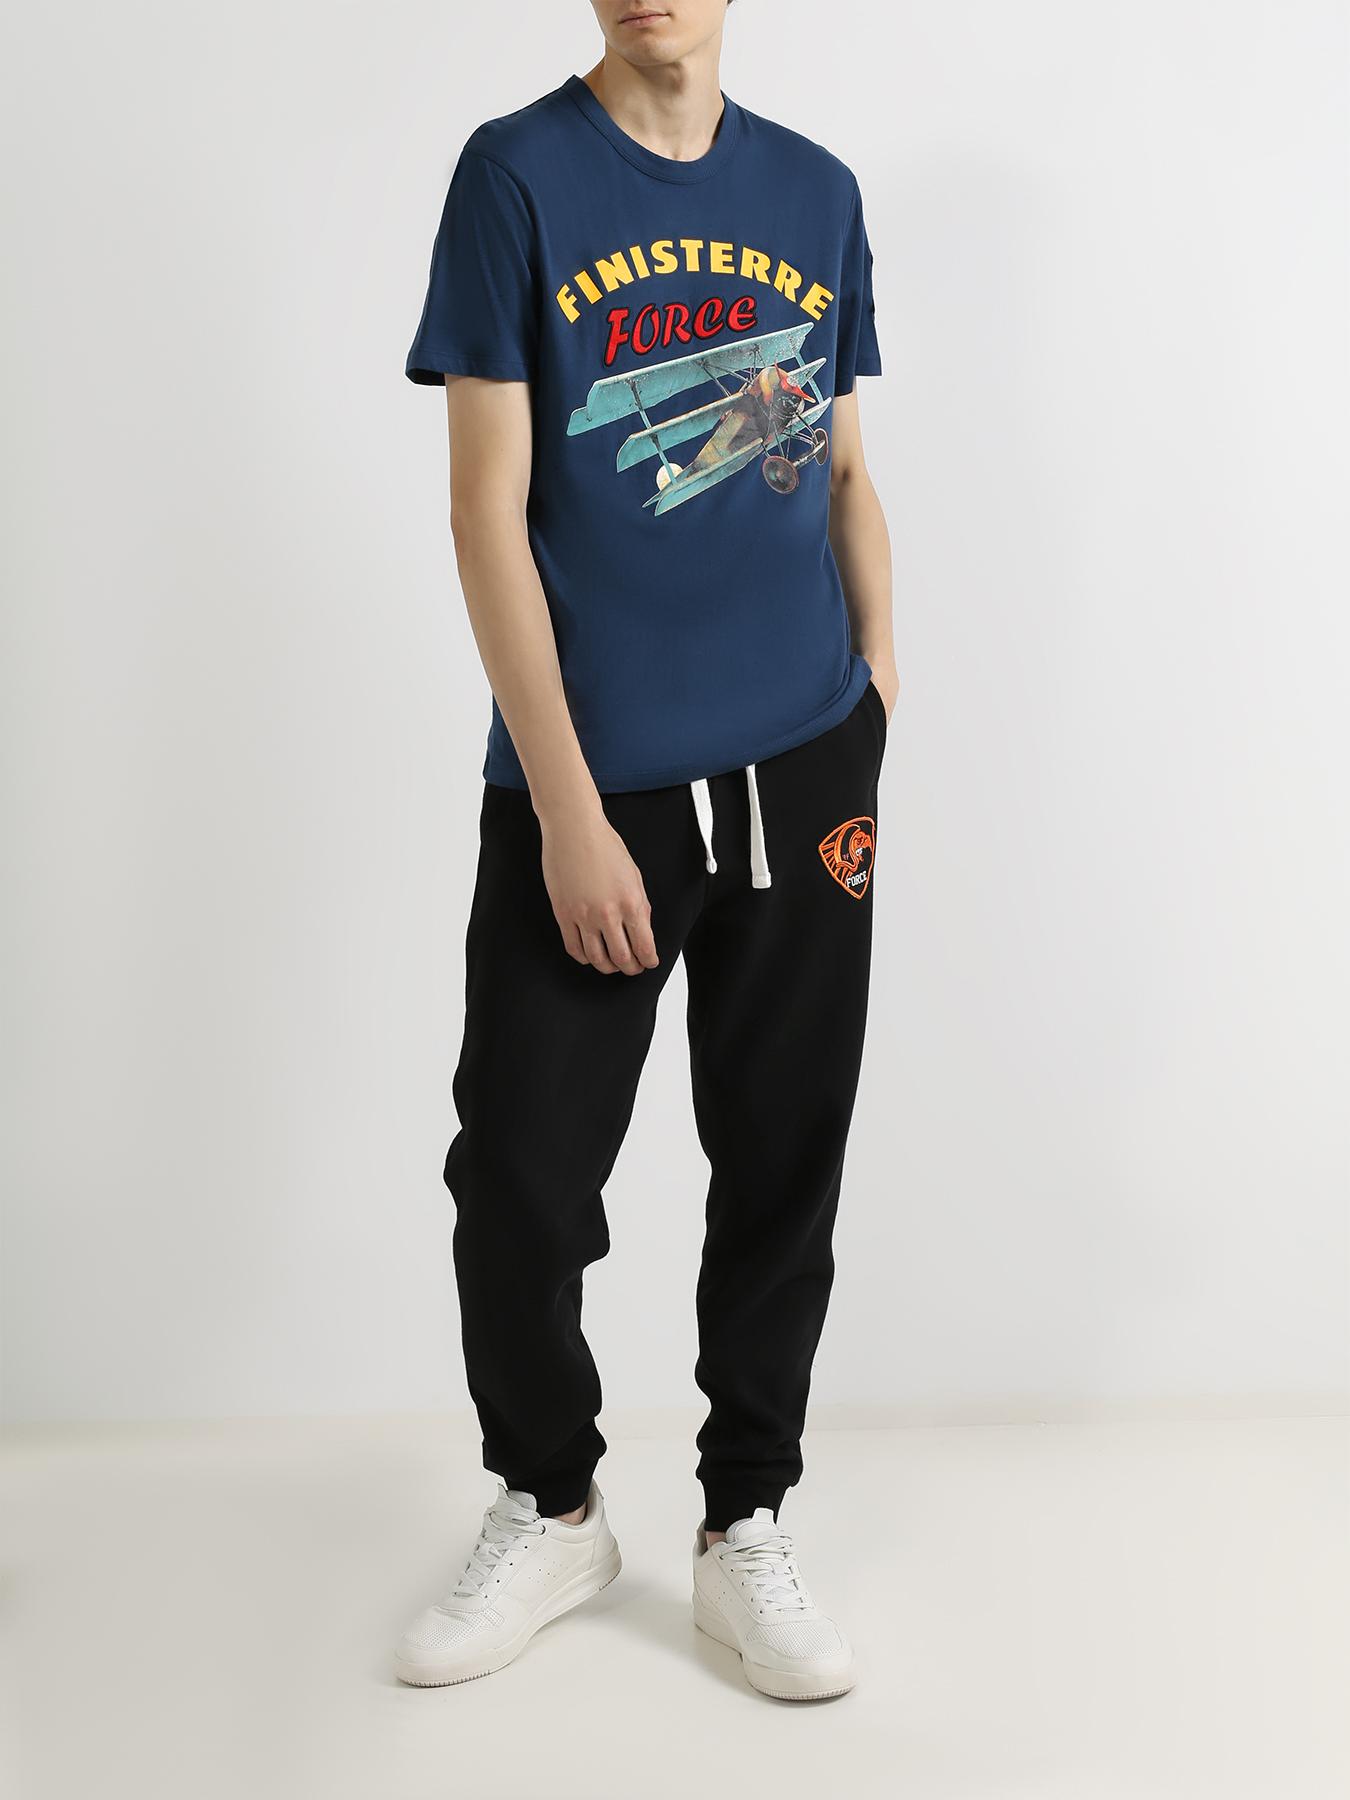 Фуфайка Finisterre Force Хлопковая футболка brioni хлопковая футболка